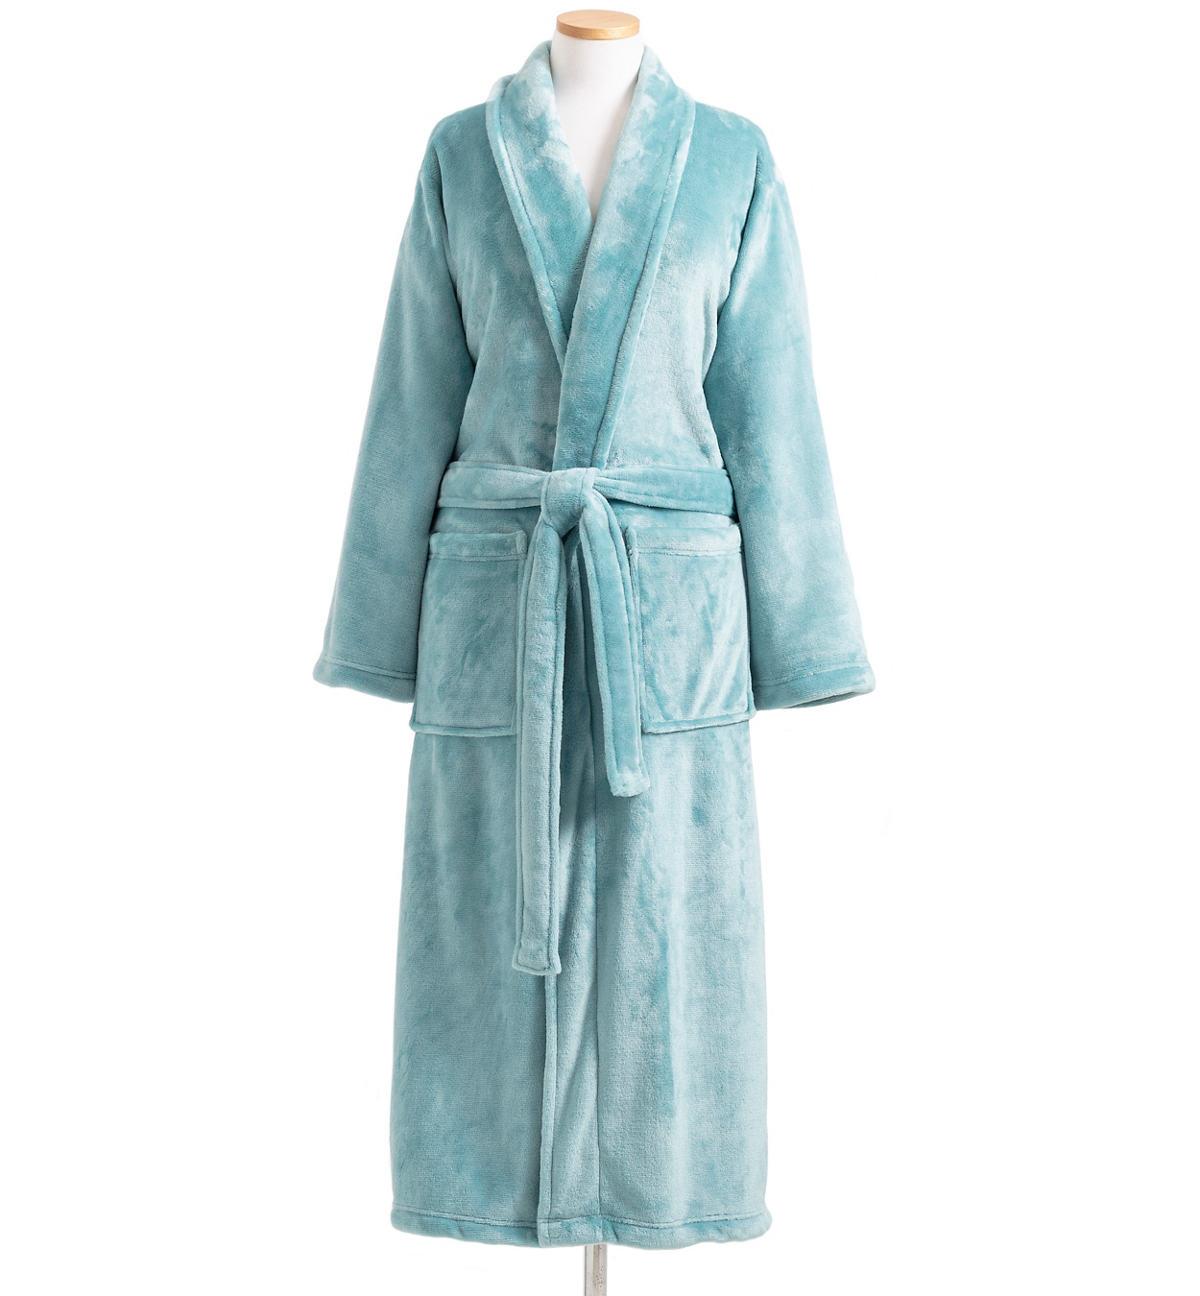 Sheepy Fleece 2.0 Teal Robe